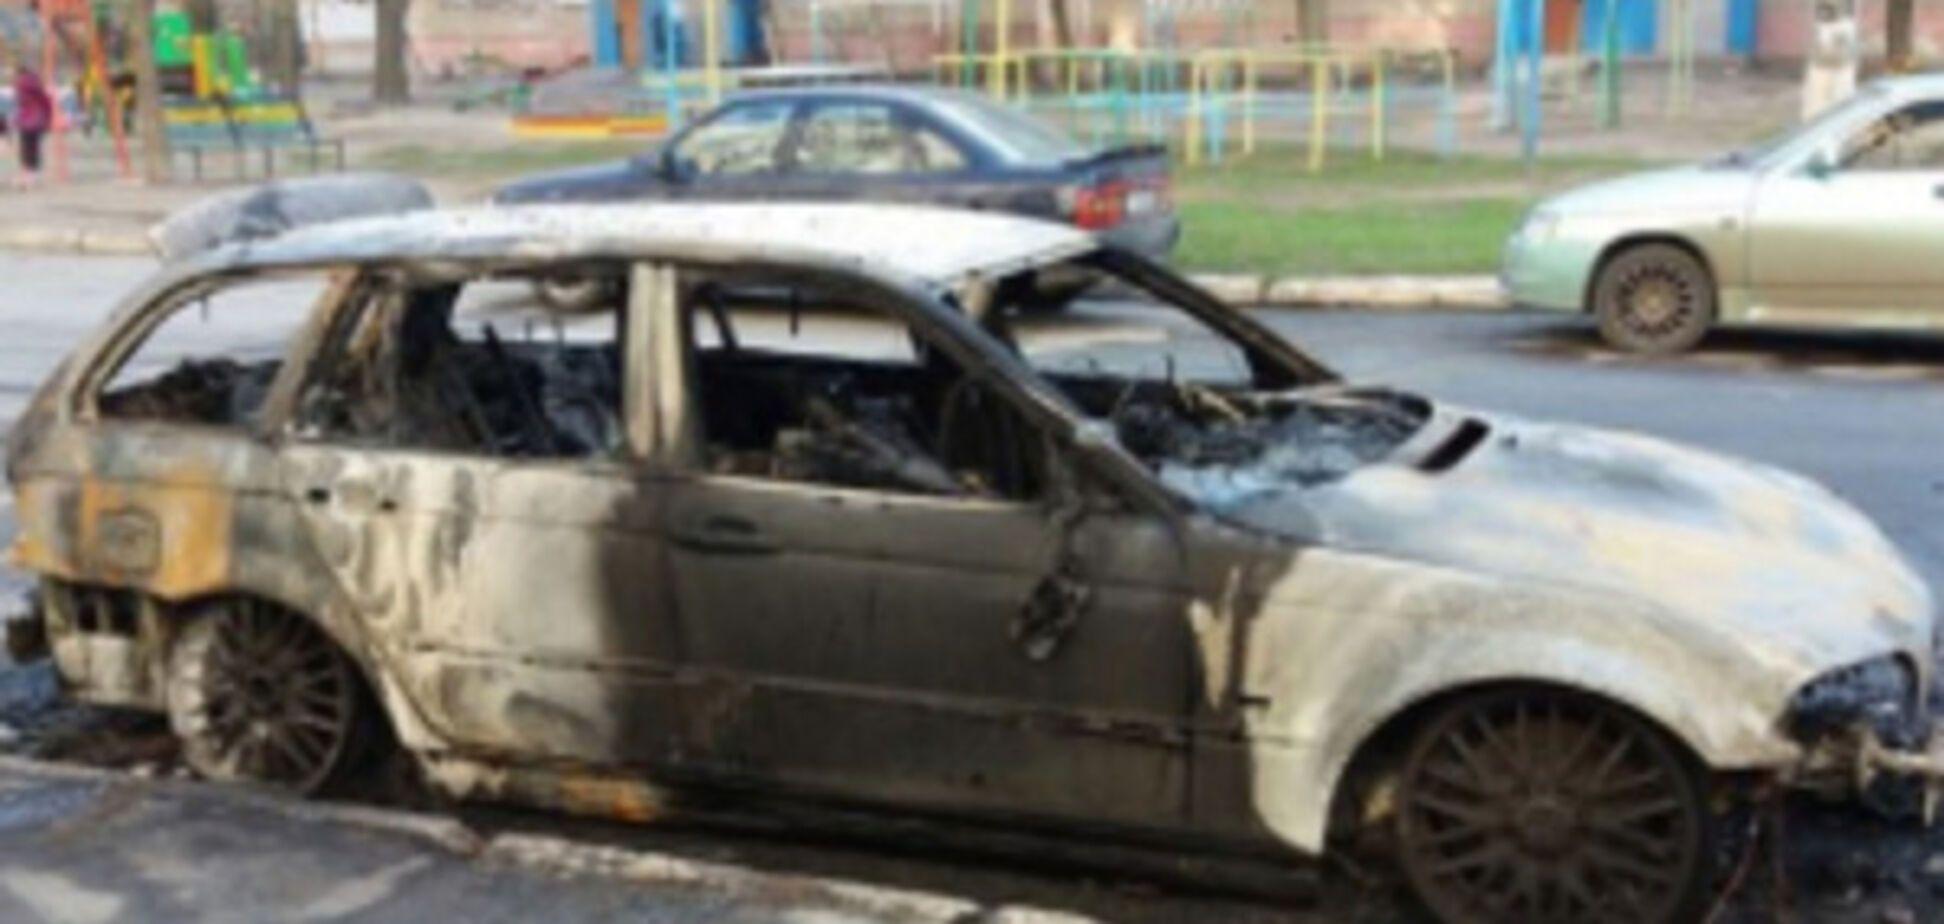 Во дворах многоэтажки почти дотла сгорело авто (ФОТО)